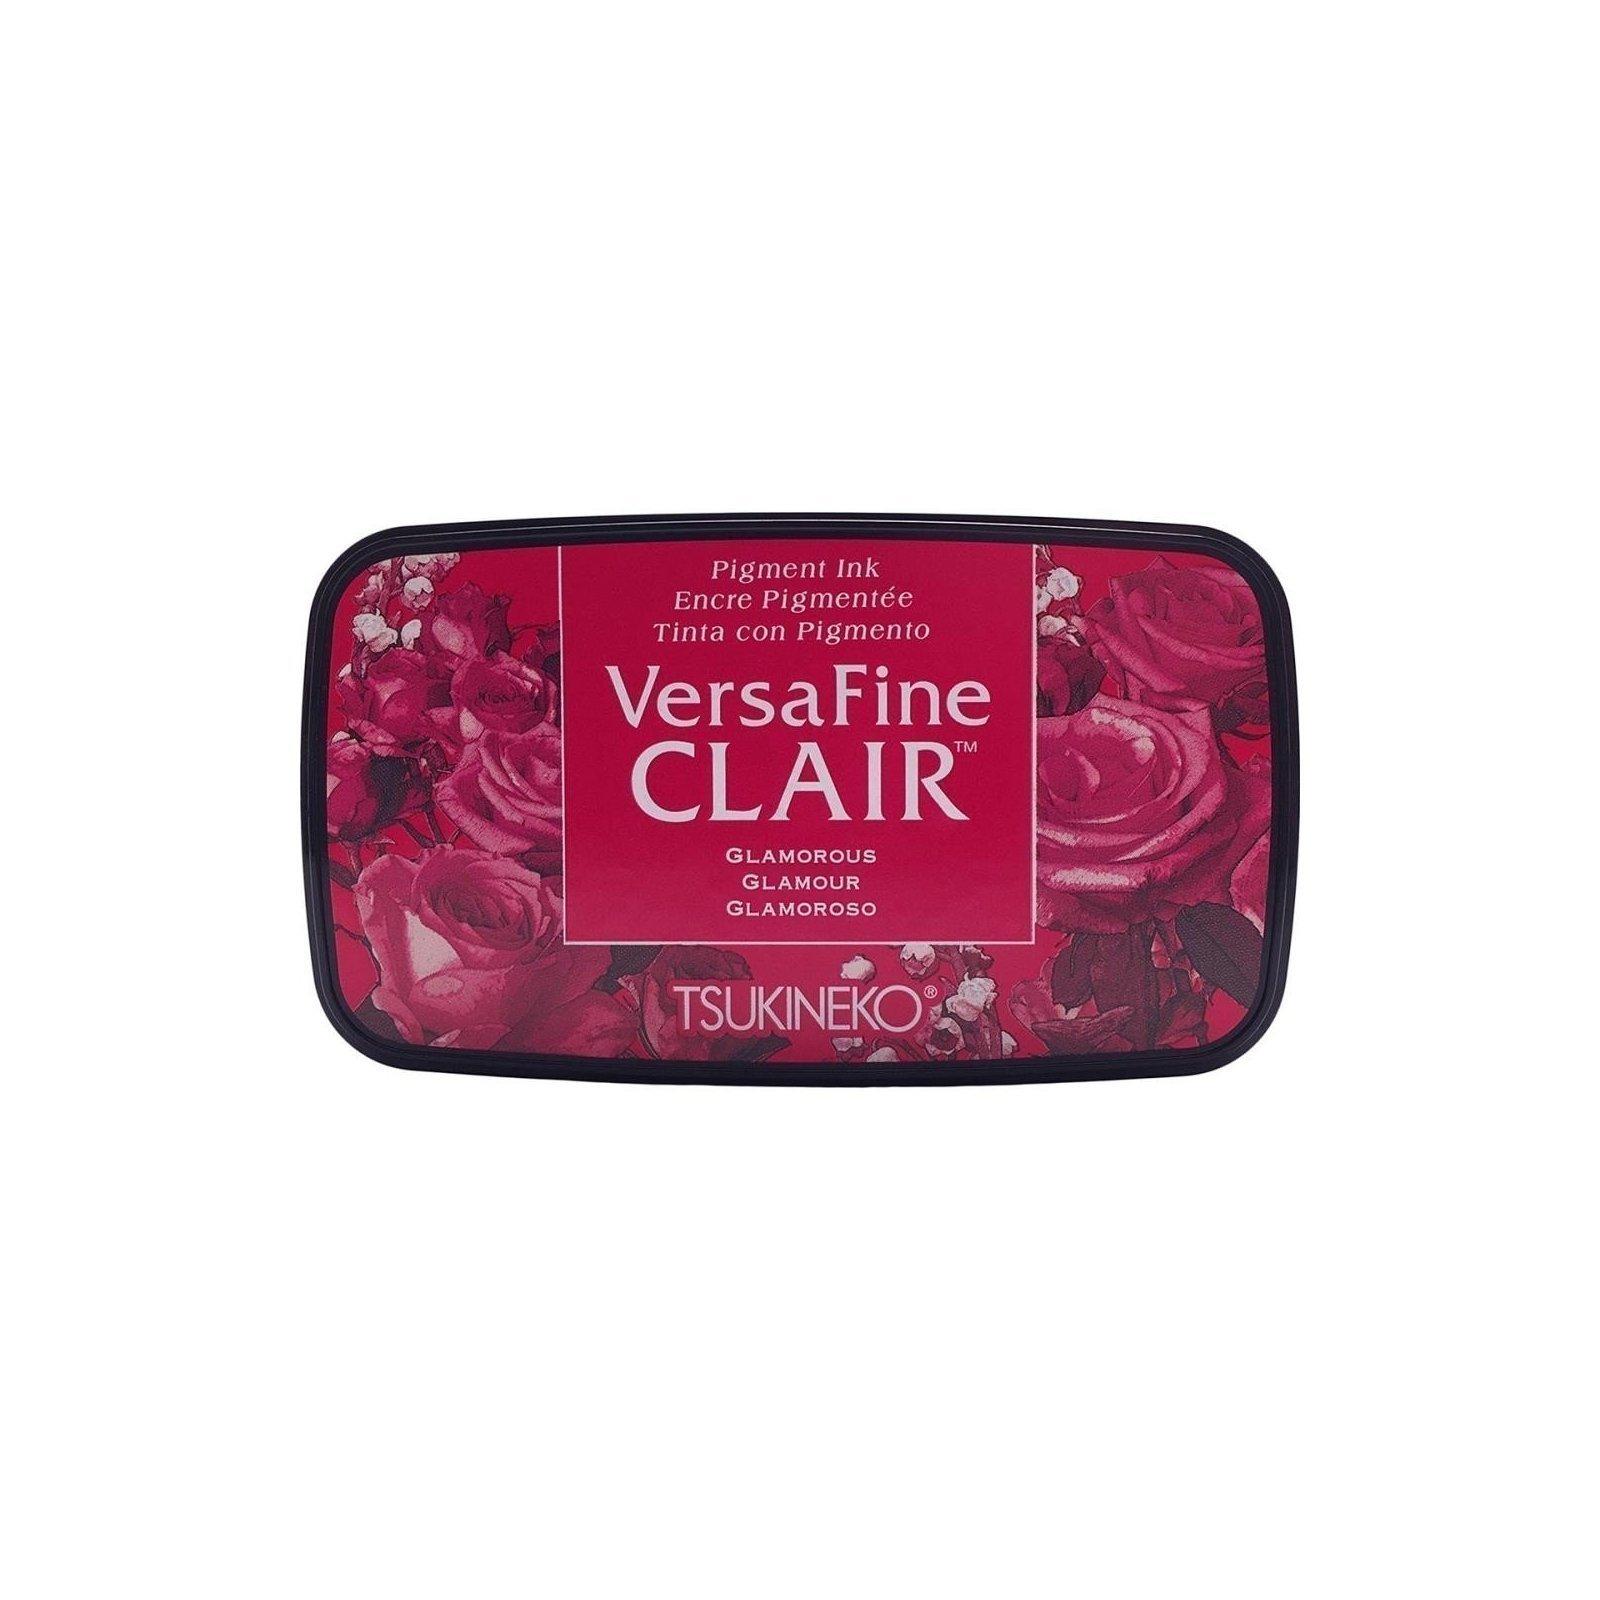 Grand encreur Versafine Clair - Rouge - Glamorous - Tsukineko